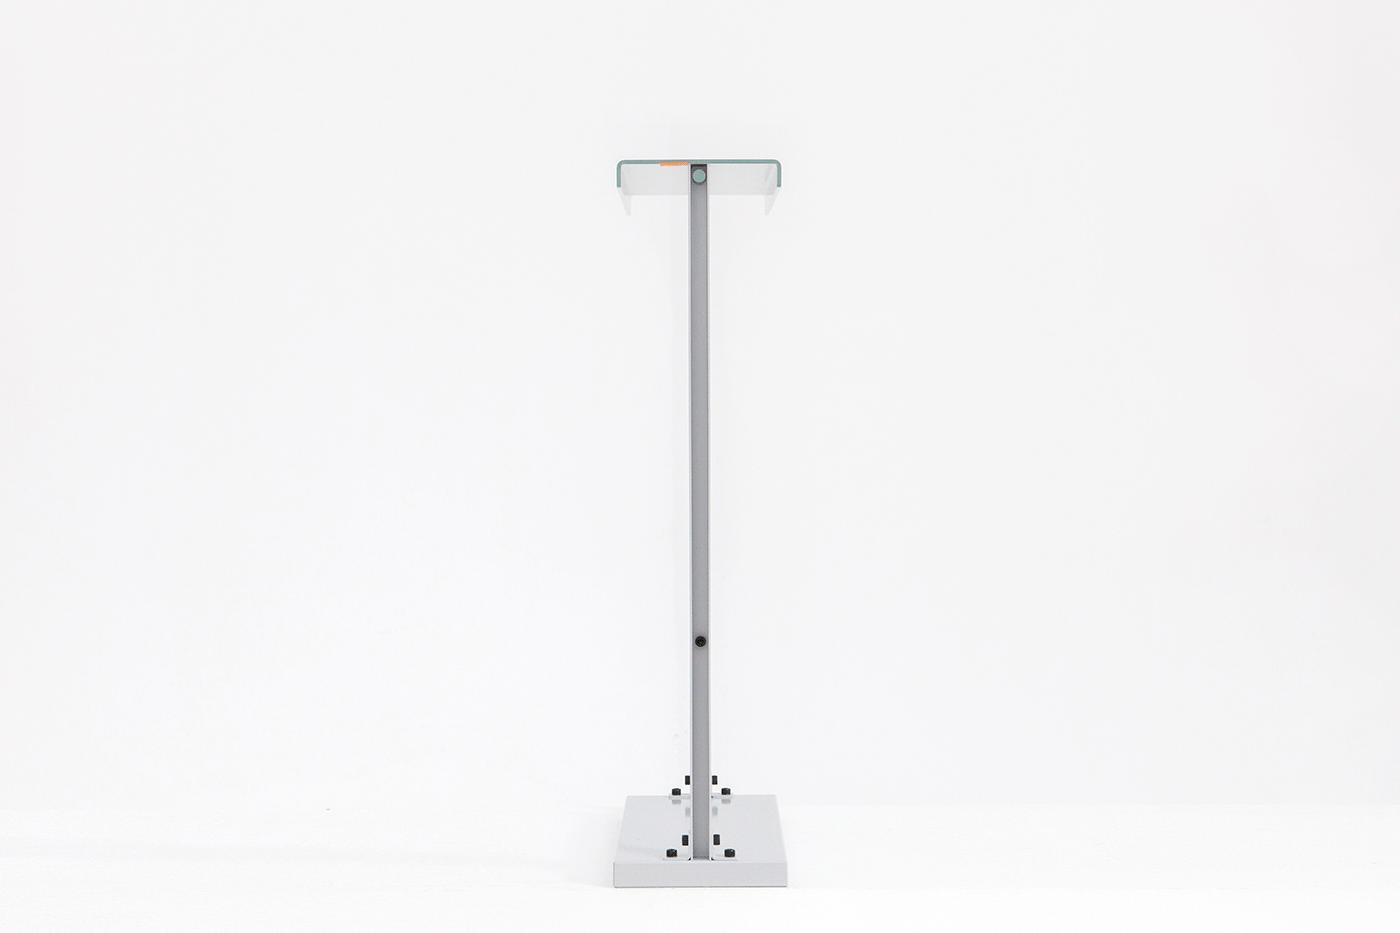 chair design furniture material object product design  가구디자인 산업디자인 제품디자인